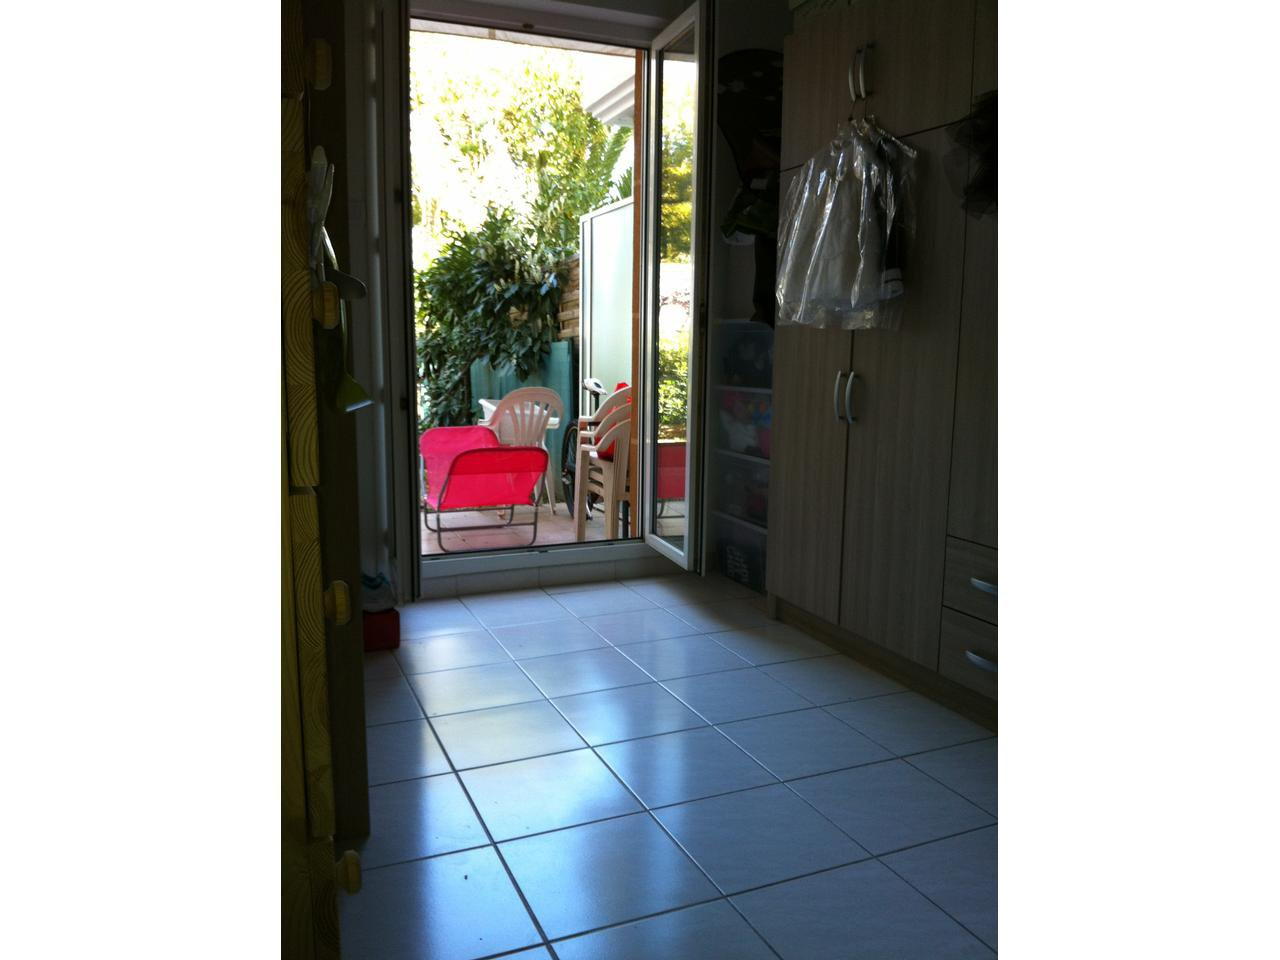 vente appartement nice corniche fleurie corniche fleurie 239 000. Black Bedroom Furniture Sets. Home Design Ideas